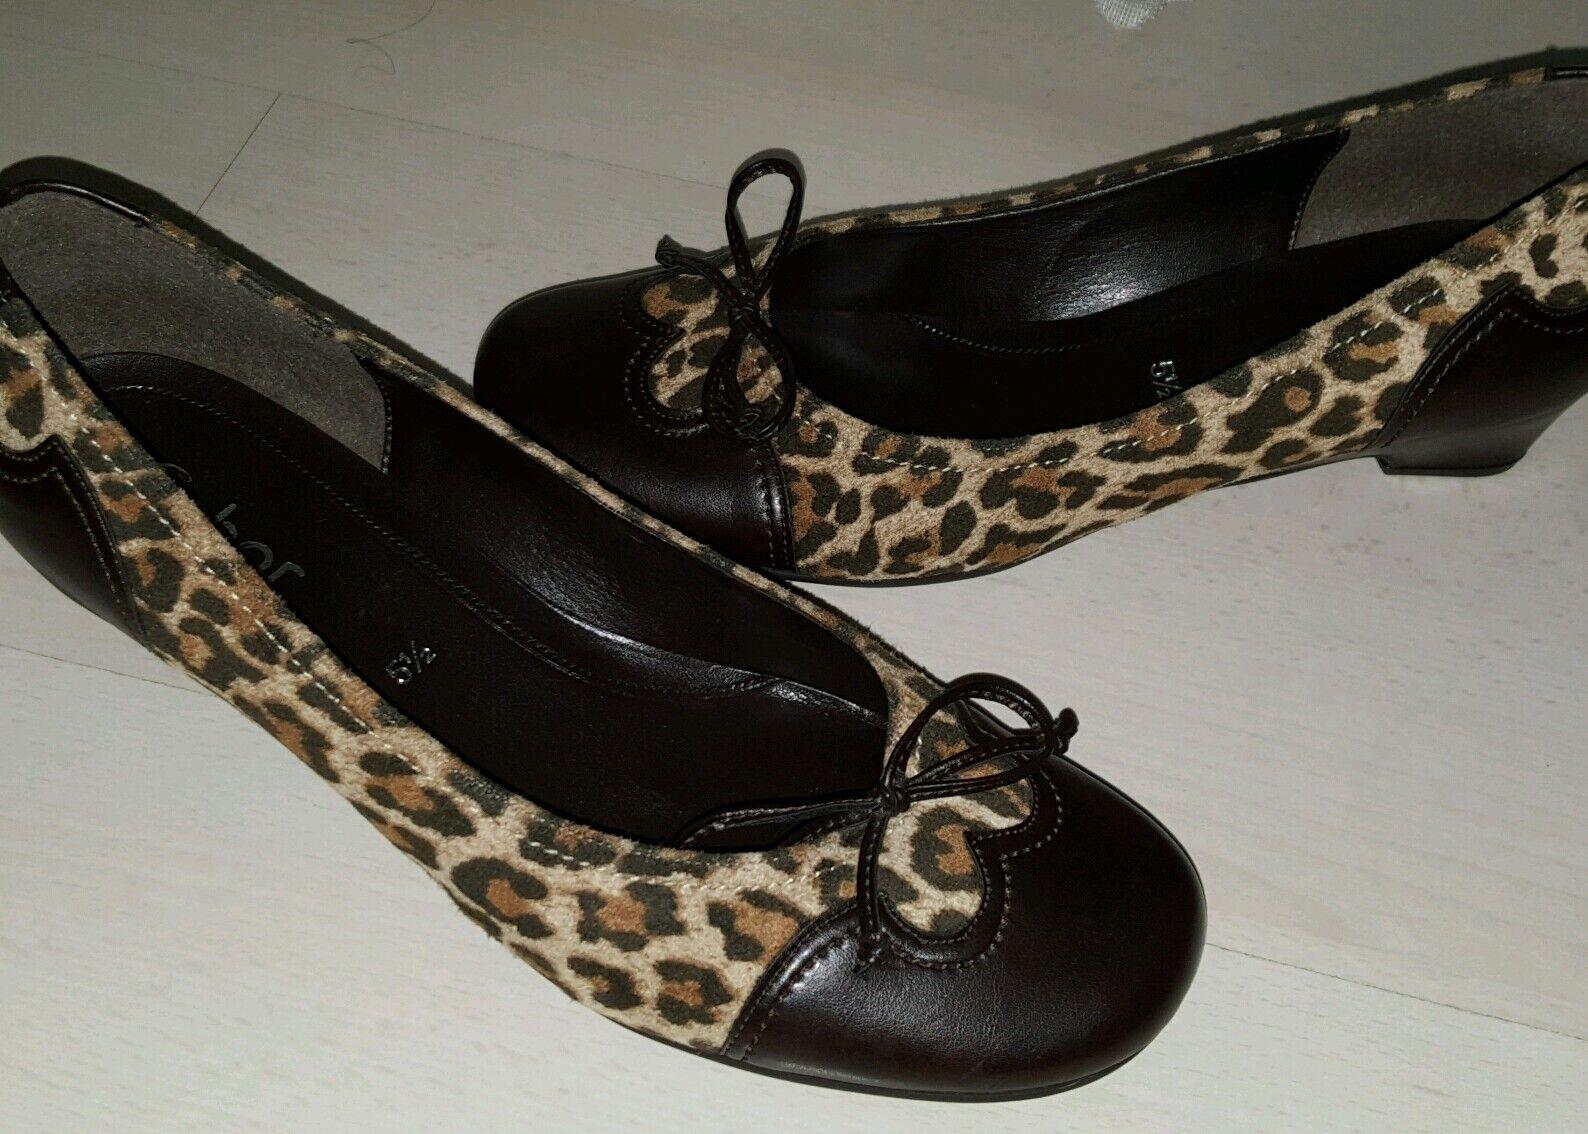 Gabor Damen Schuhe gr. 5,5/ 38 1/2 Leoprint Leder neu